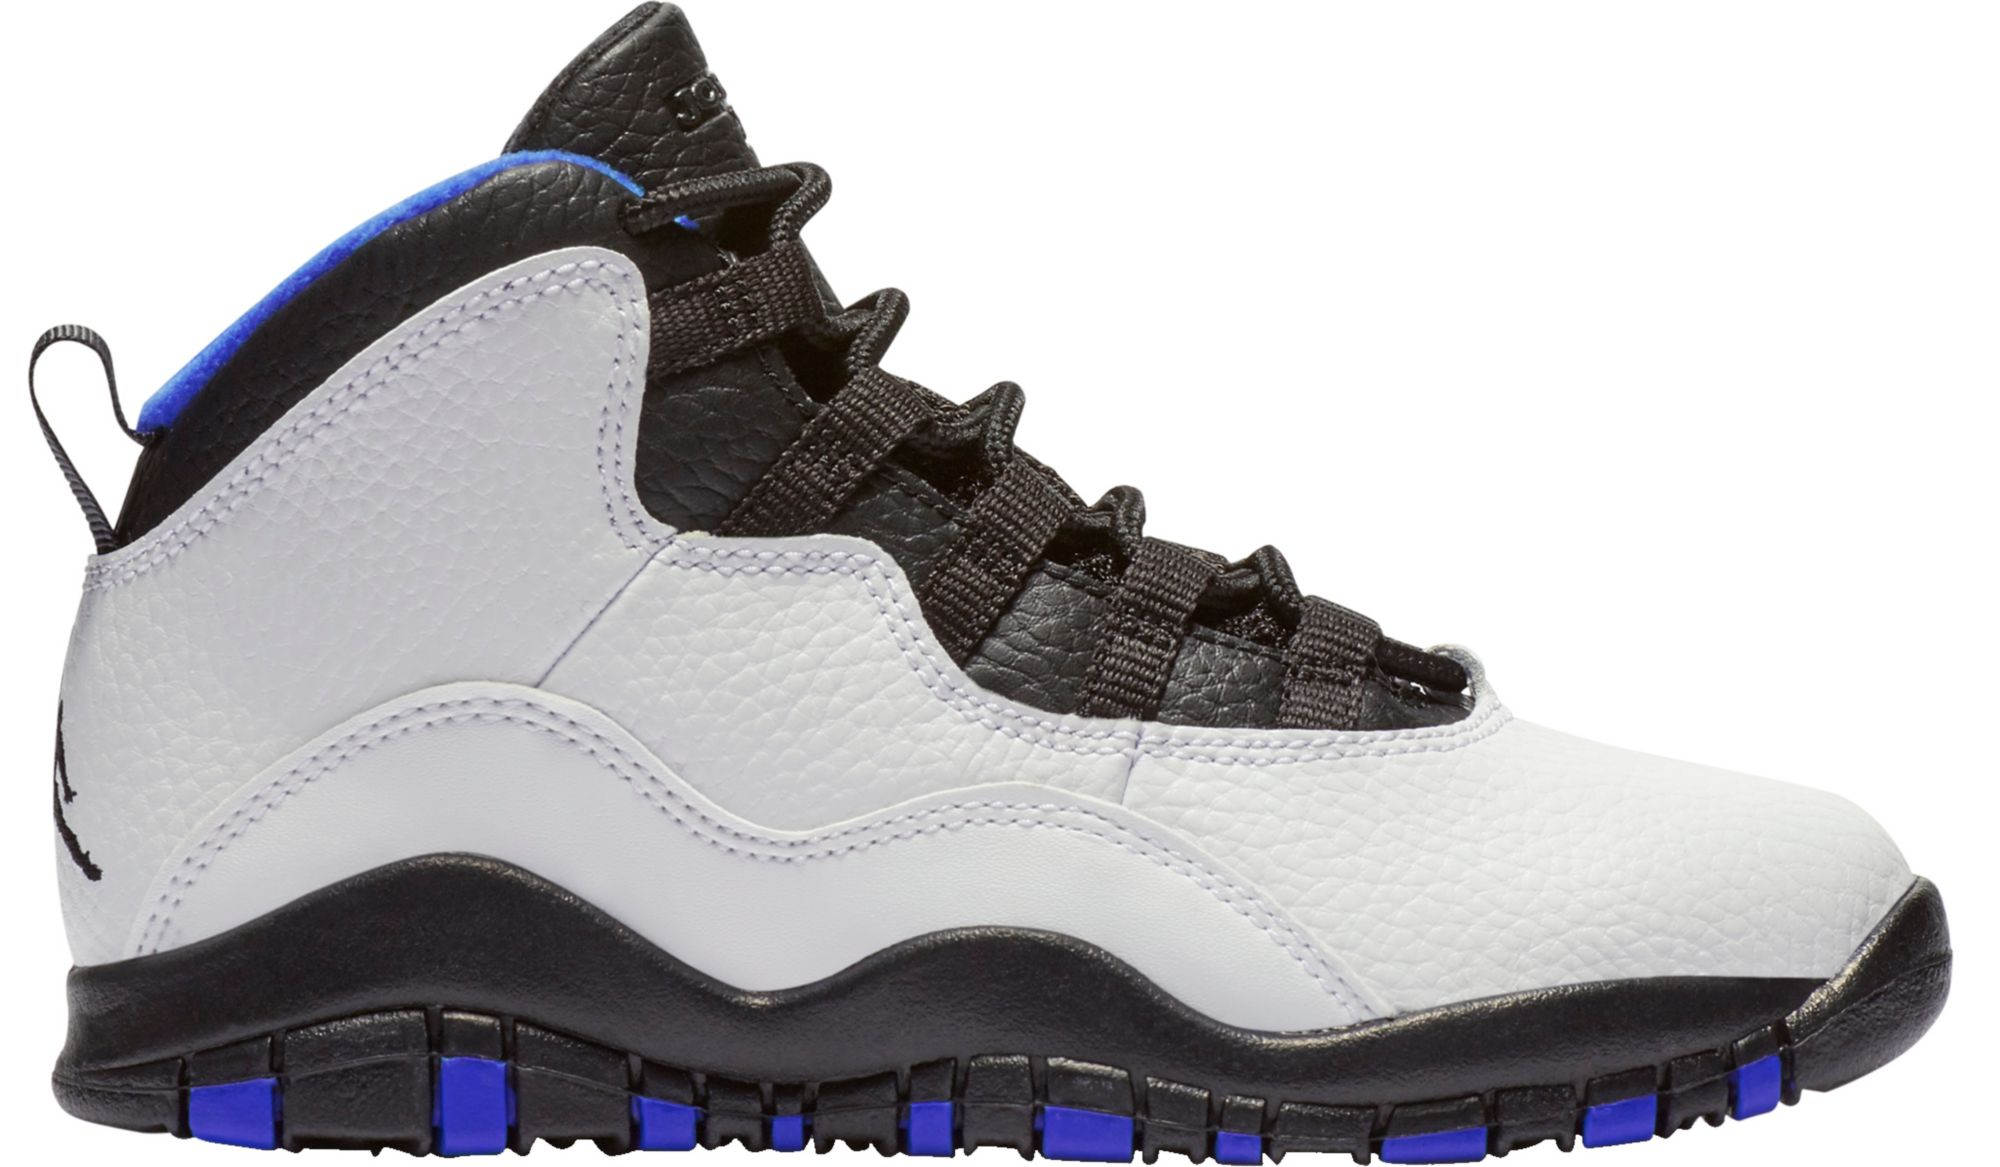 0128f4679fb6ac Jordan Kids  Preschool Air Jordan Retro 10 Basketball Shoes